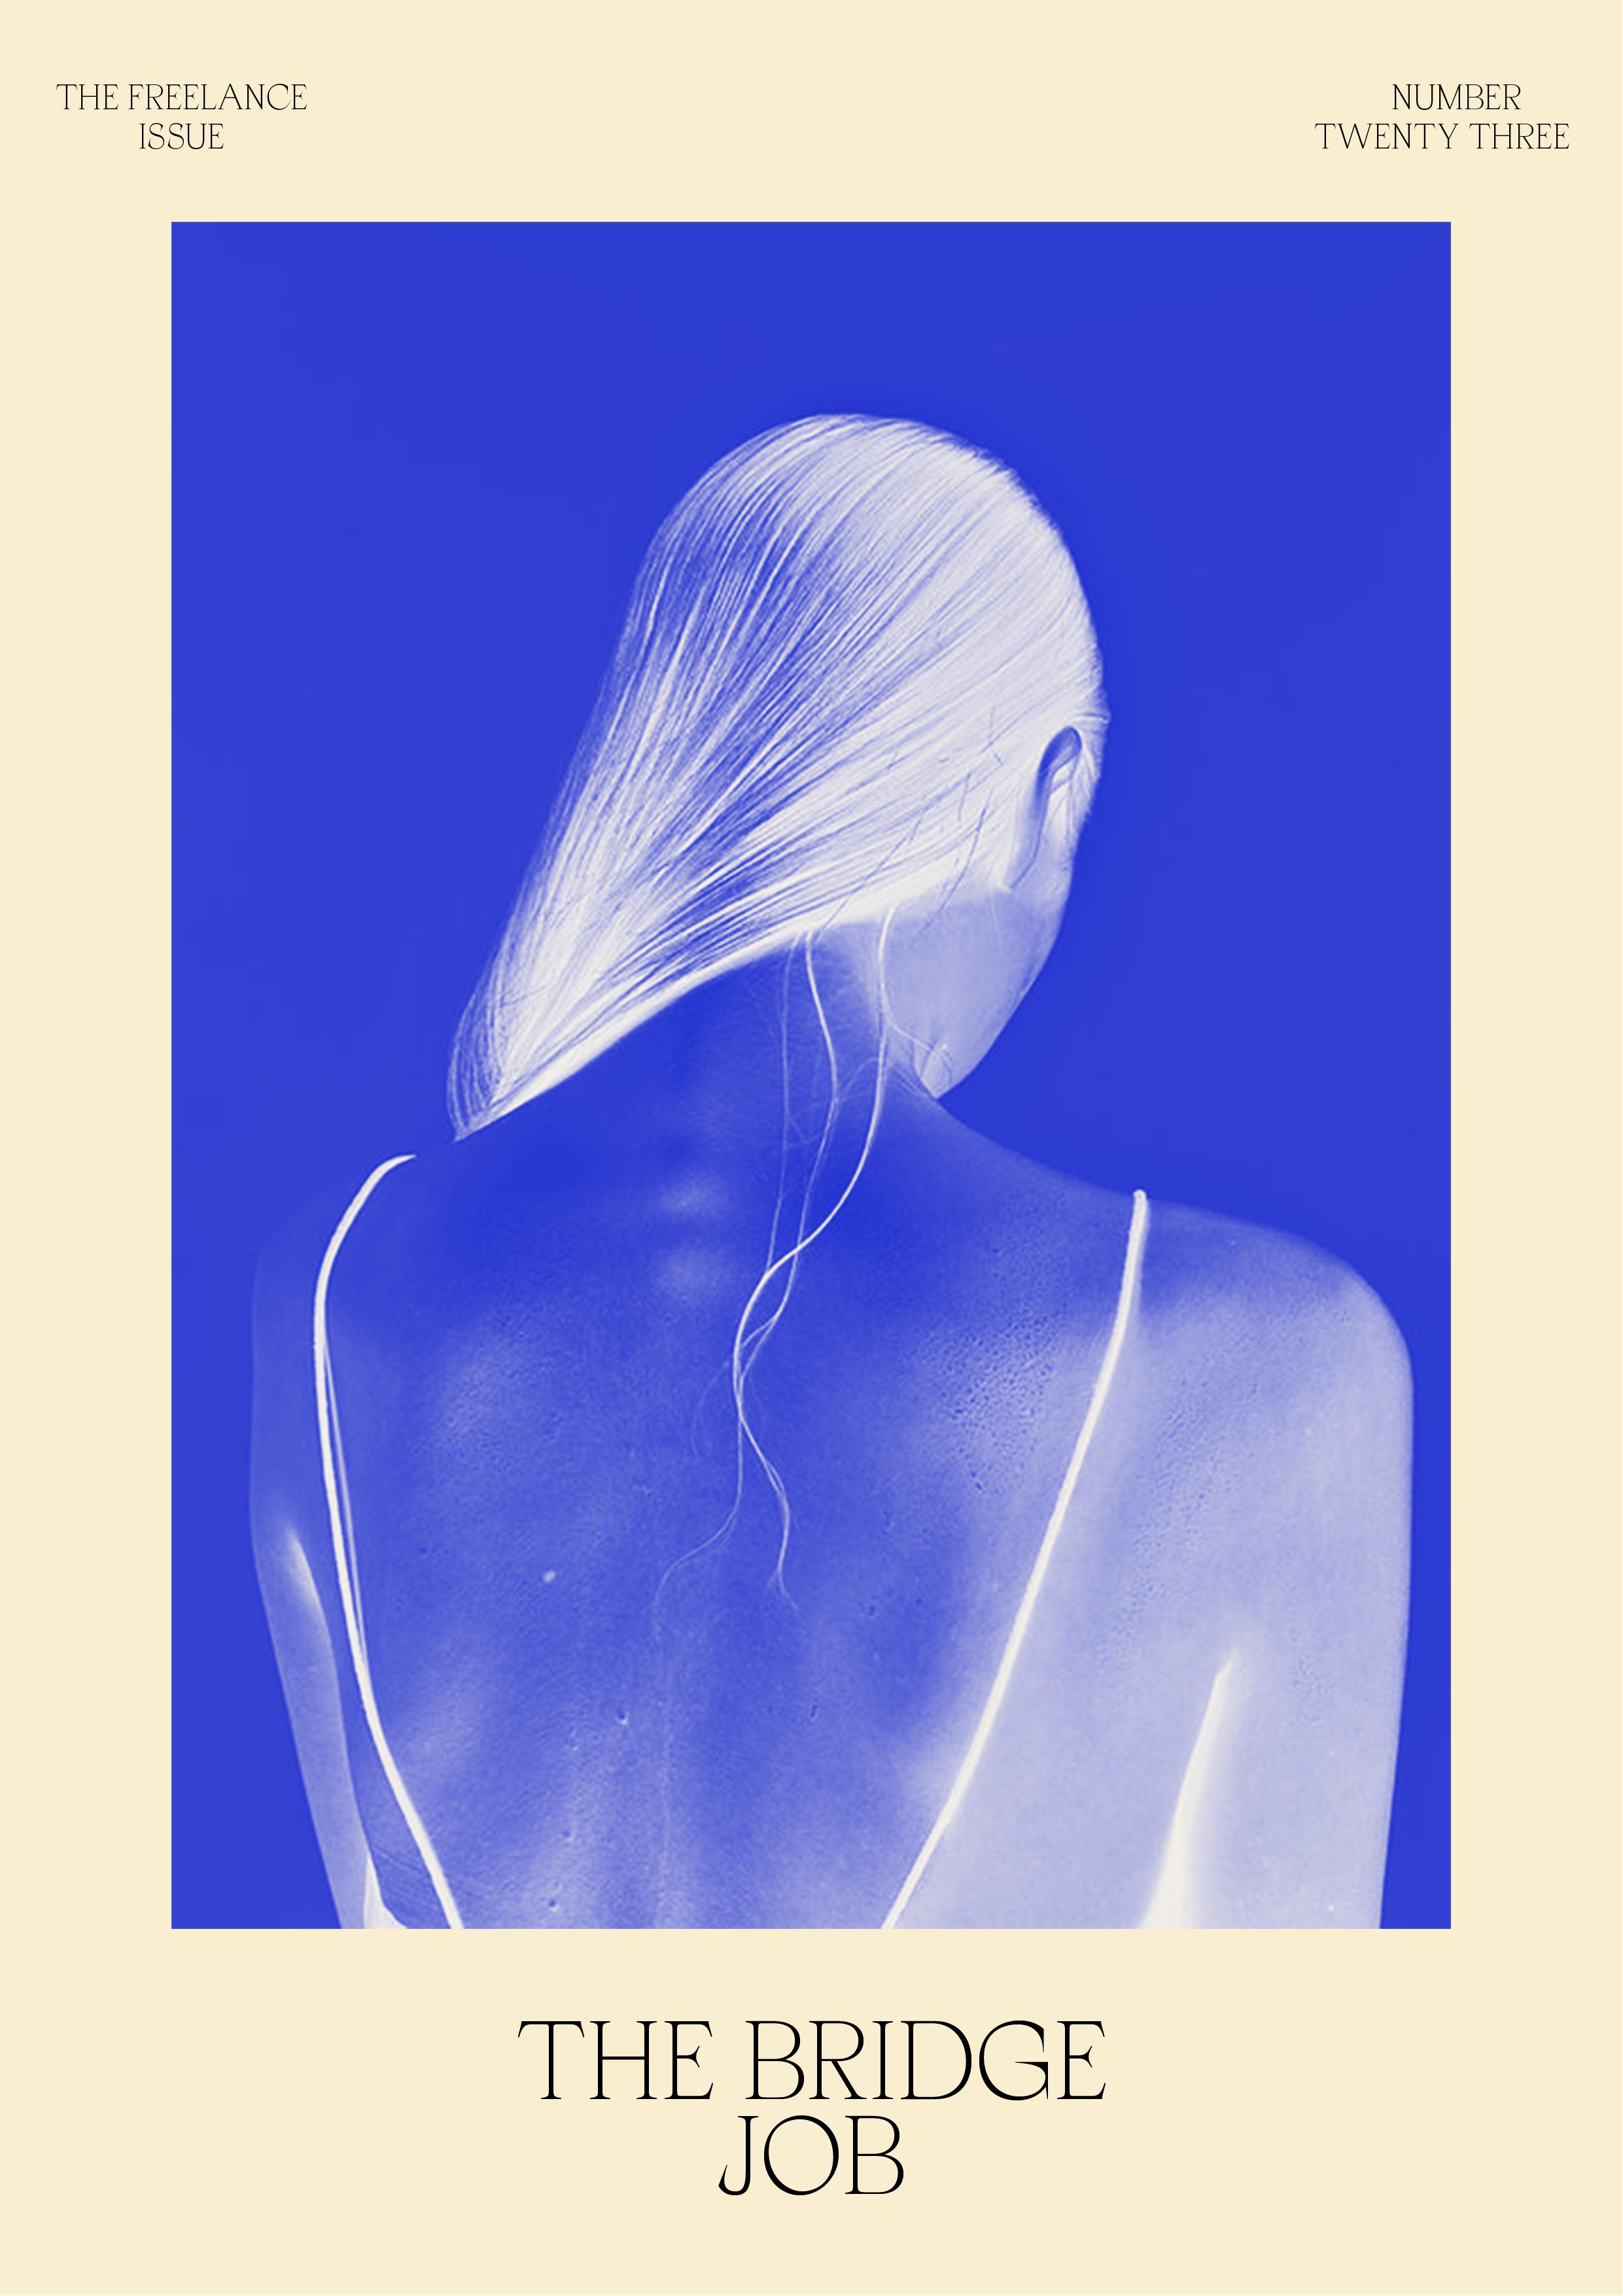 The Freelance Issue No.23 // The Bridge Job #design #typography #graphicdesign #onlineshop #poster #editorialdesign #minimalism #designblog #selfcareblog #mentalhealth #freelance #designstudio